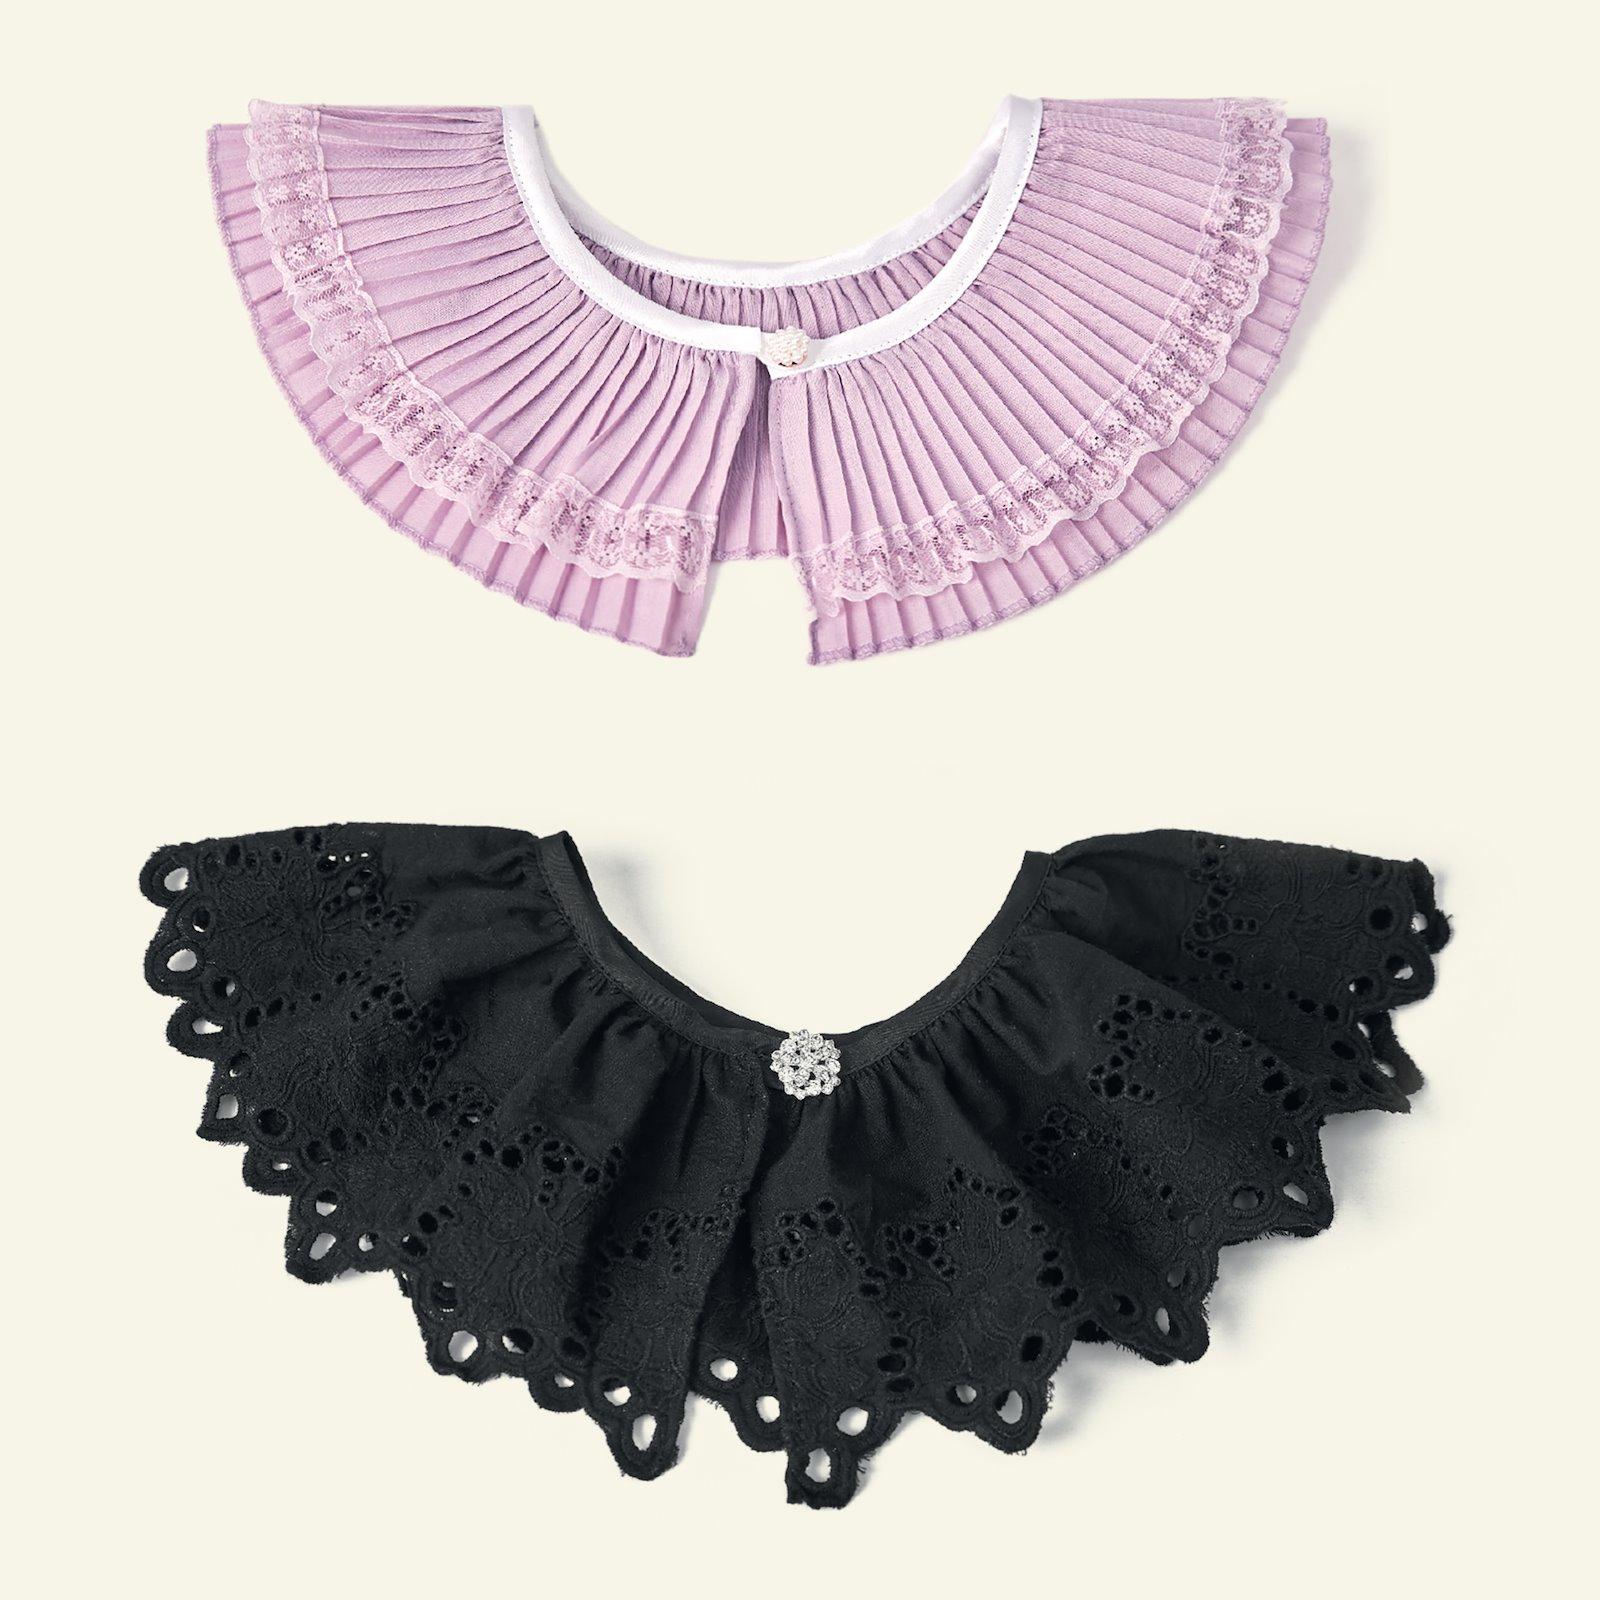 Ruffled collar DIY9000_collar_ruffels.png